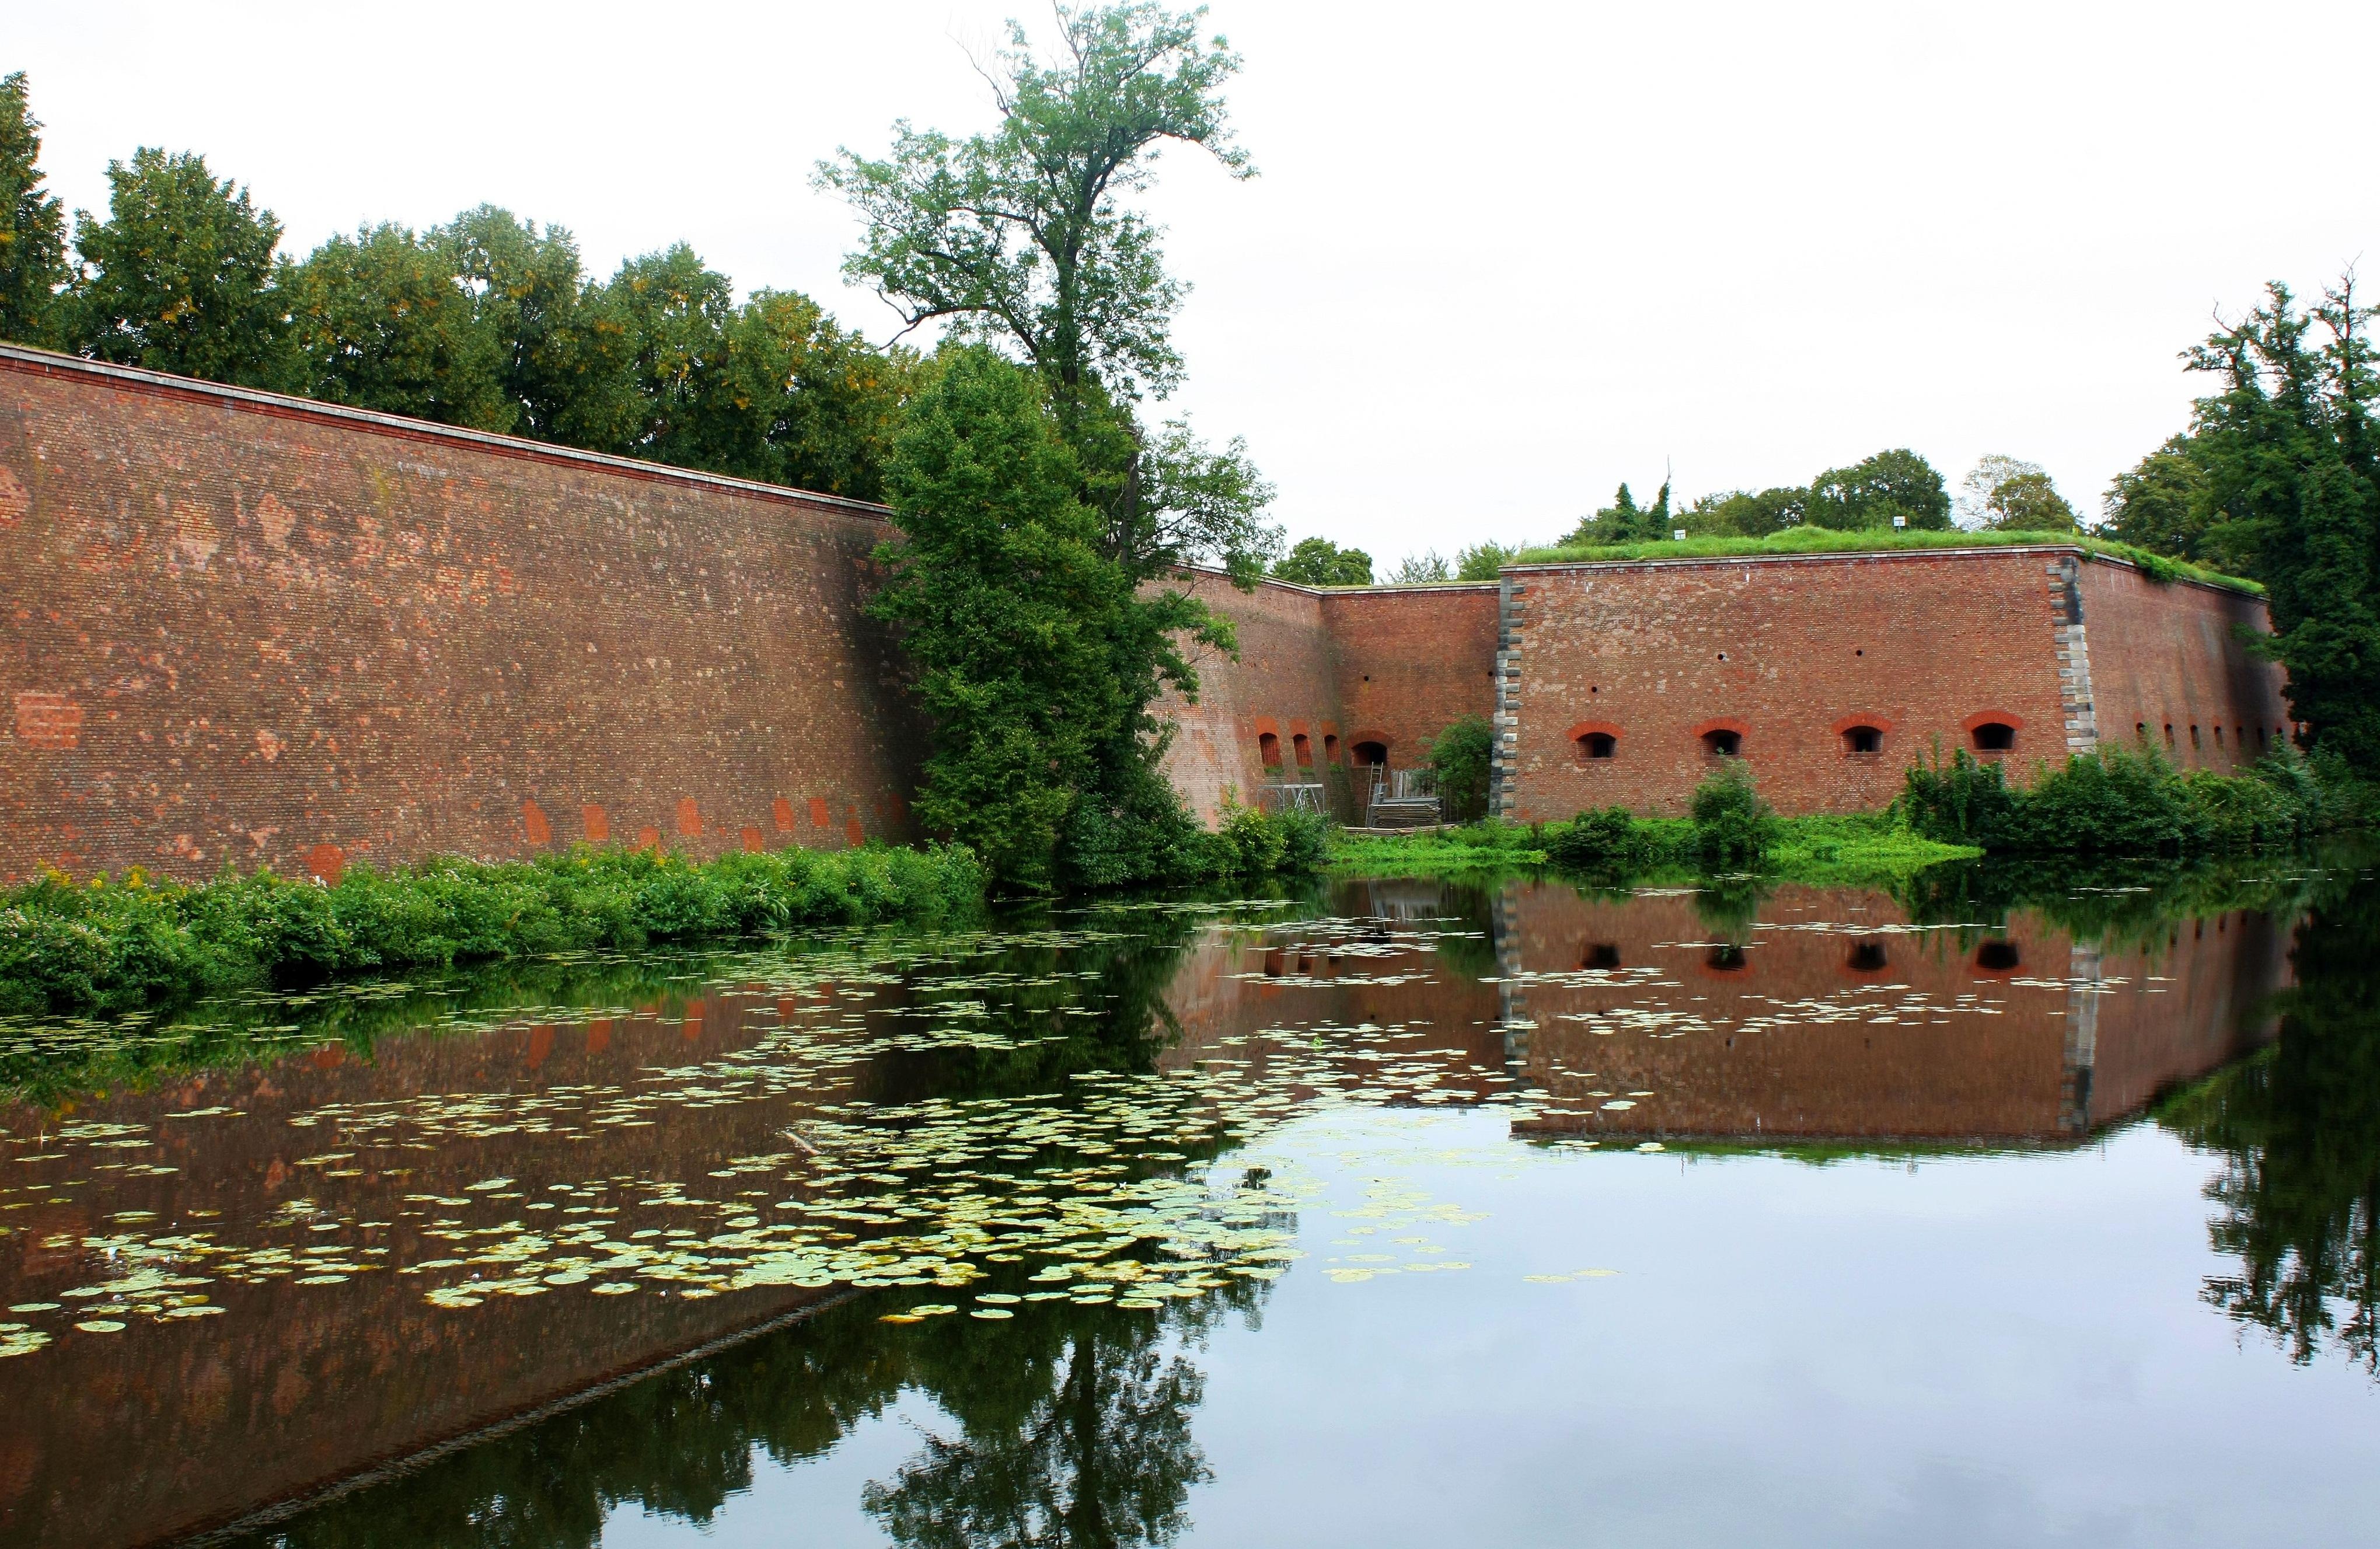 File:Zitadelle Spandau (09085439).jpg - Wikimedia Commons